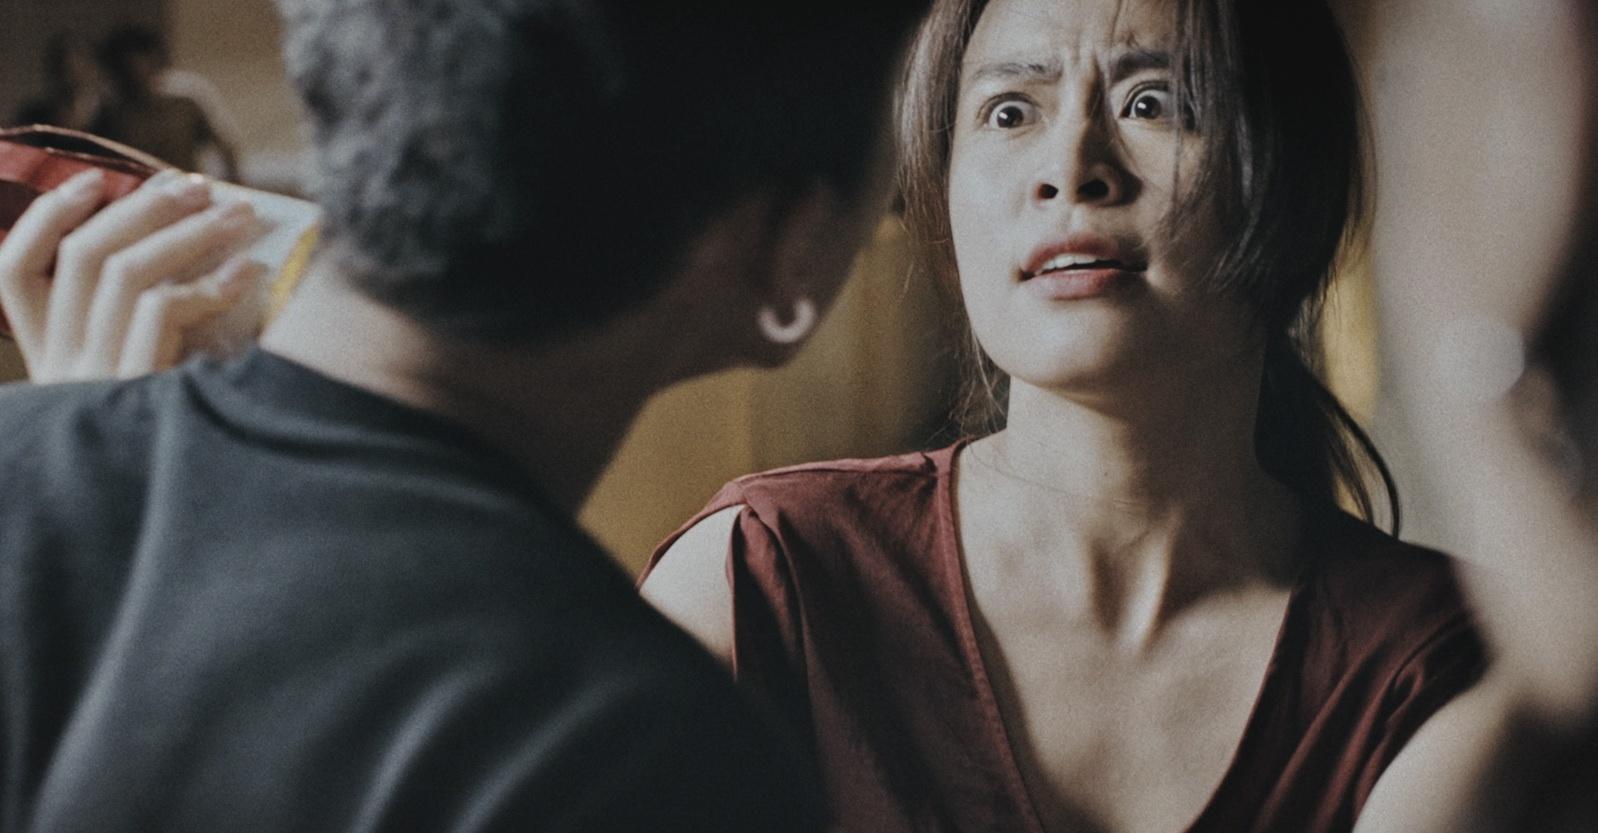 review phim Trai tim quai vat anh 1